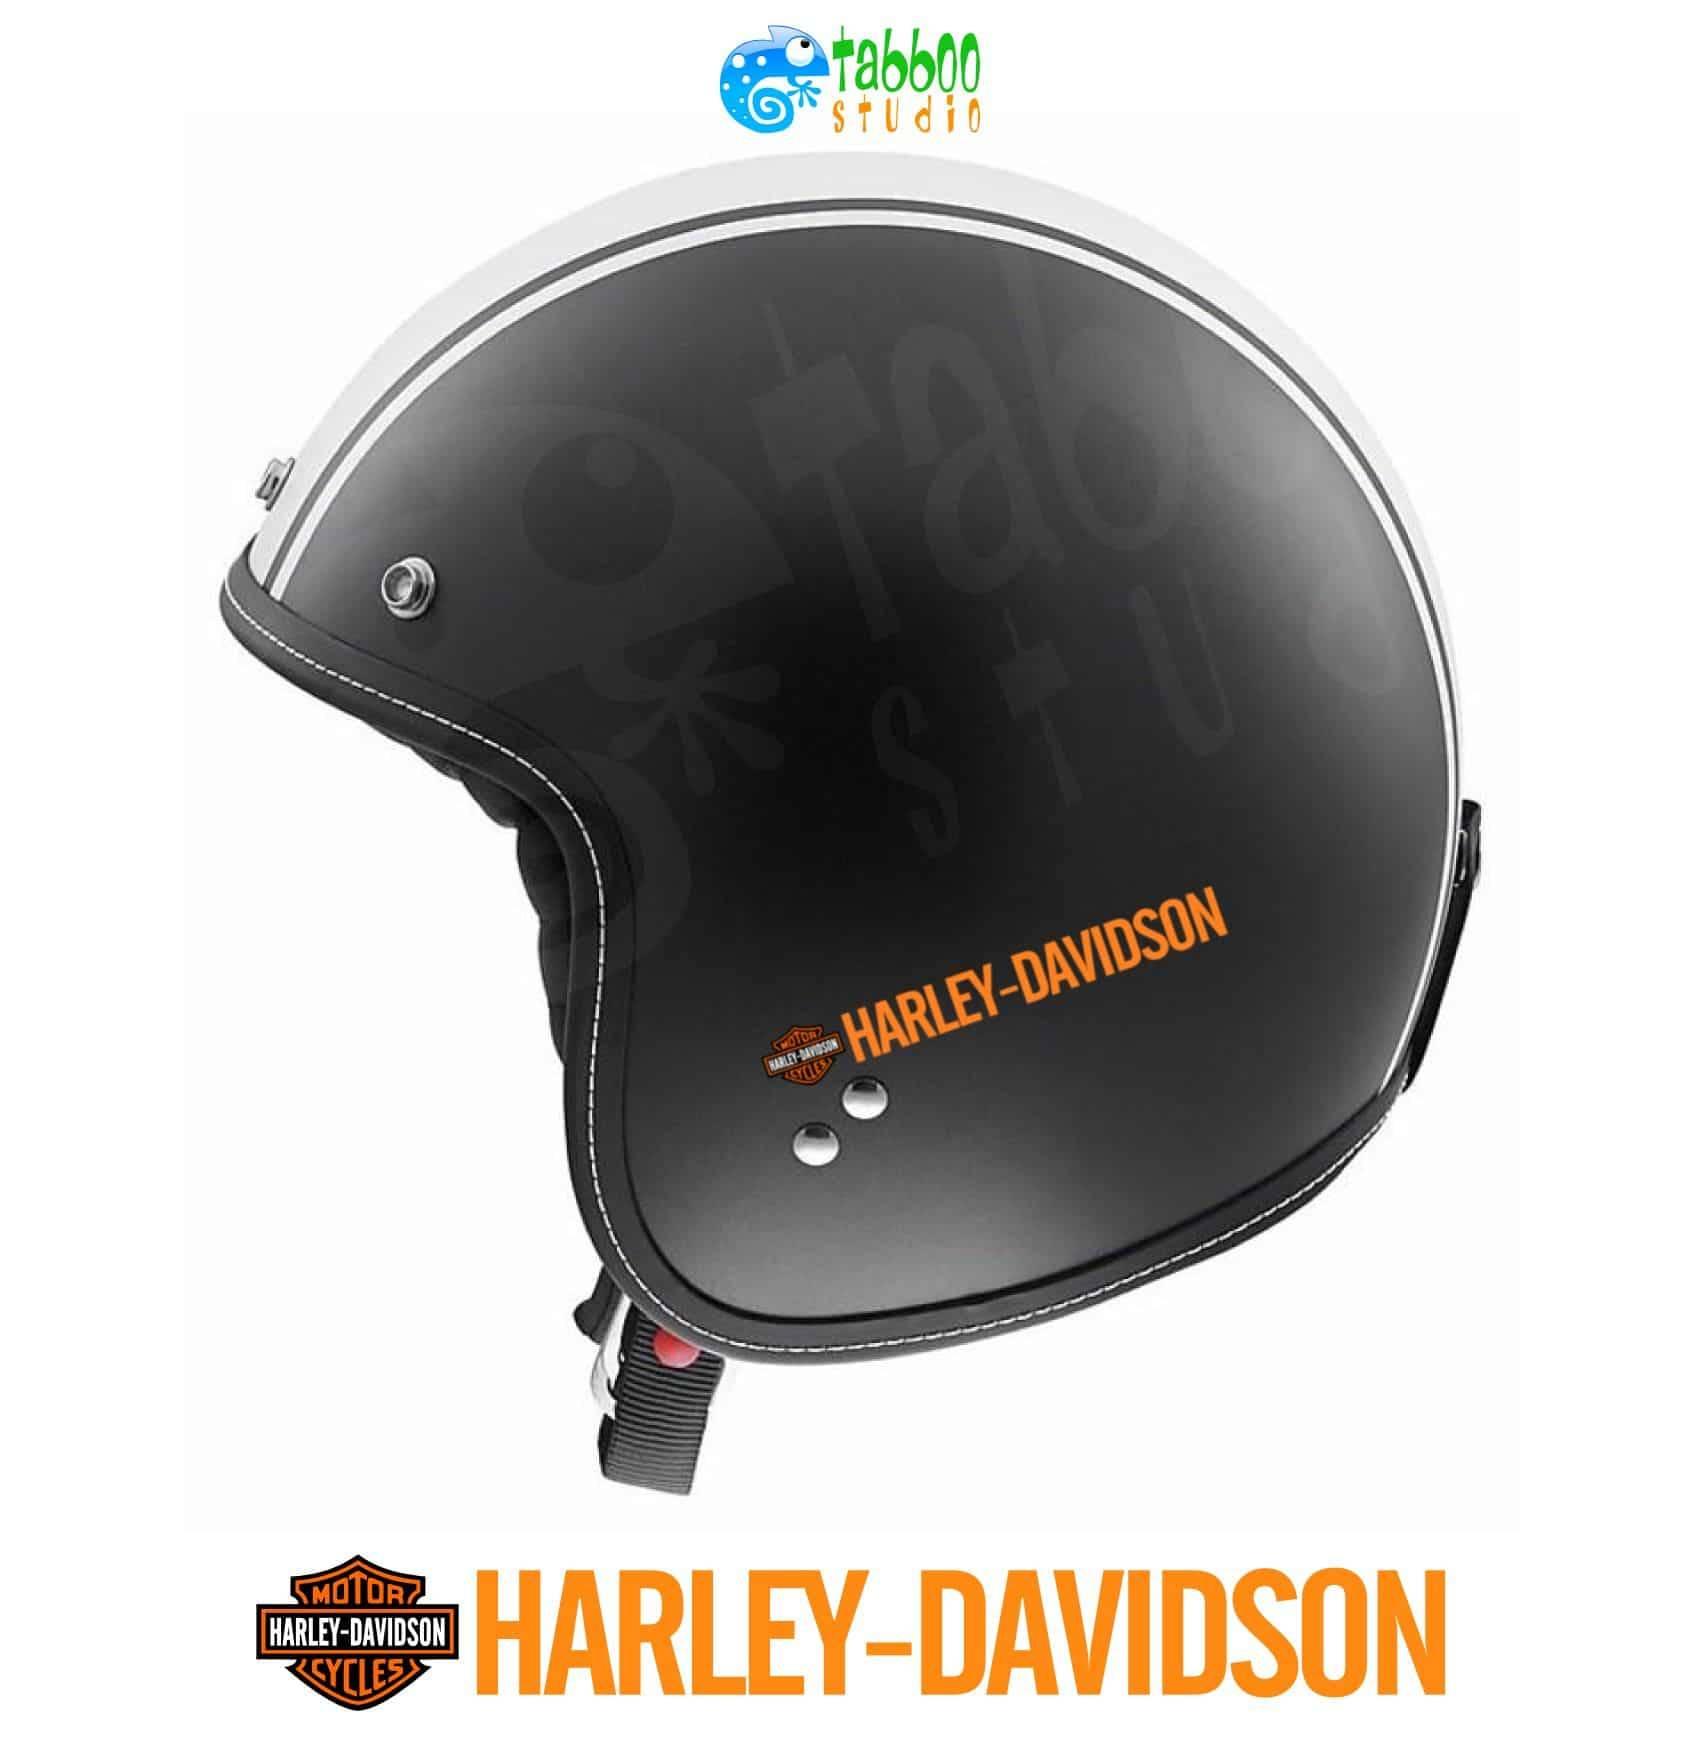 4 harley davidson helmet stickers